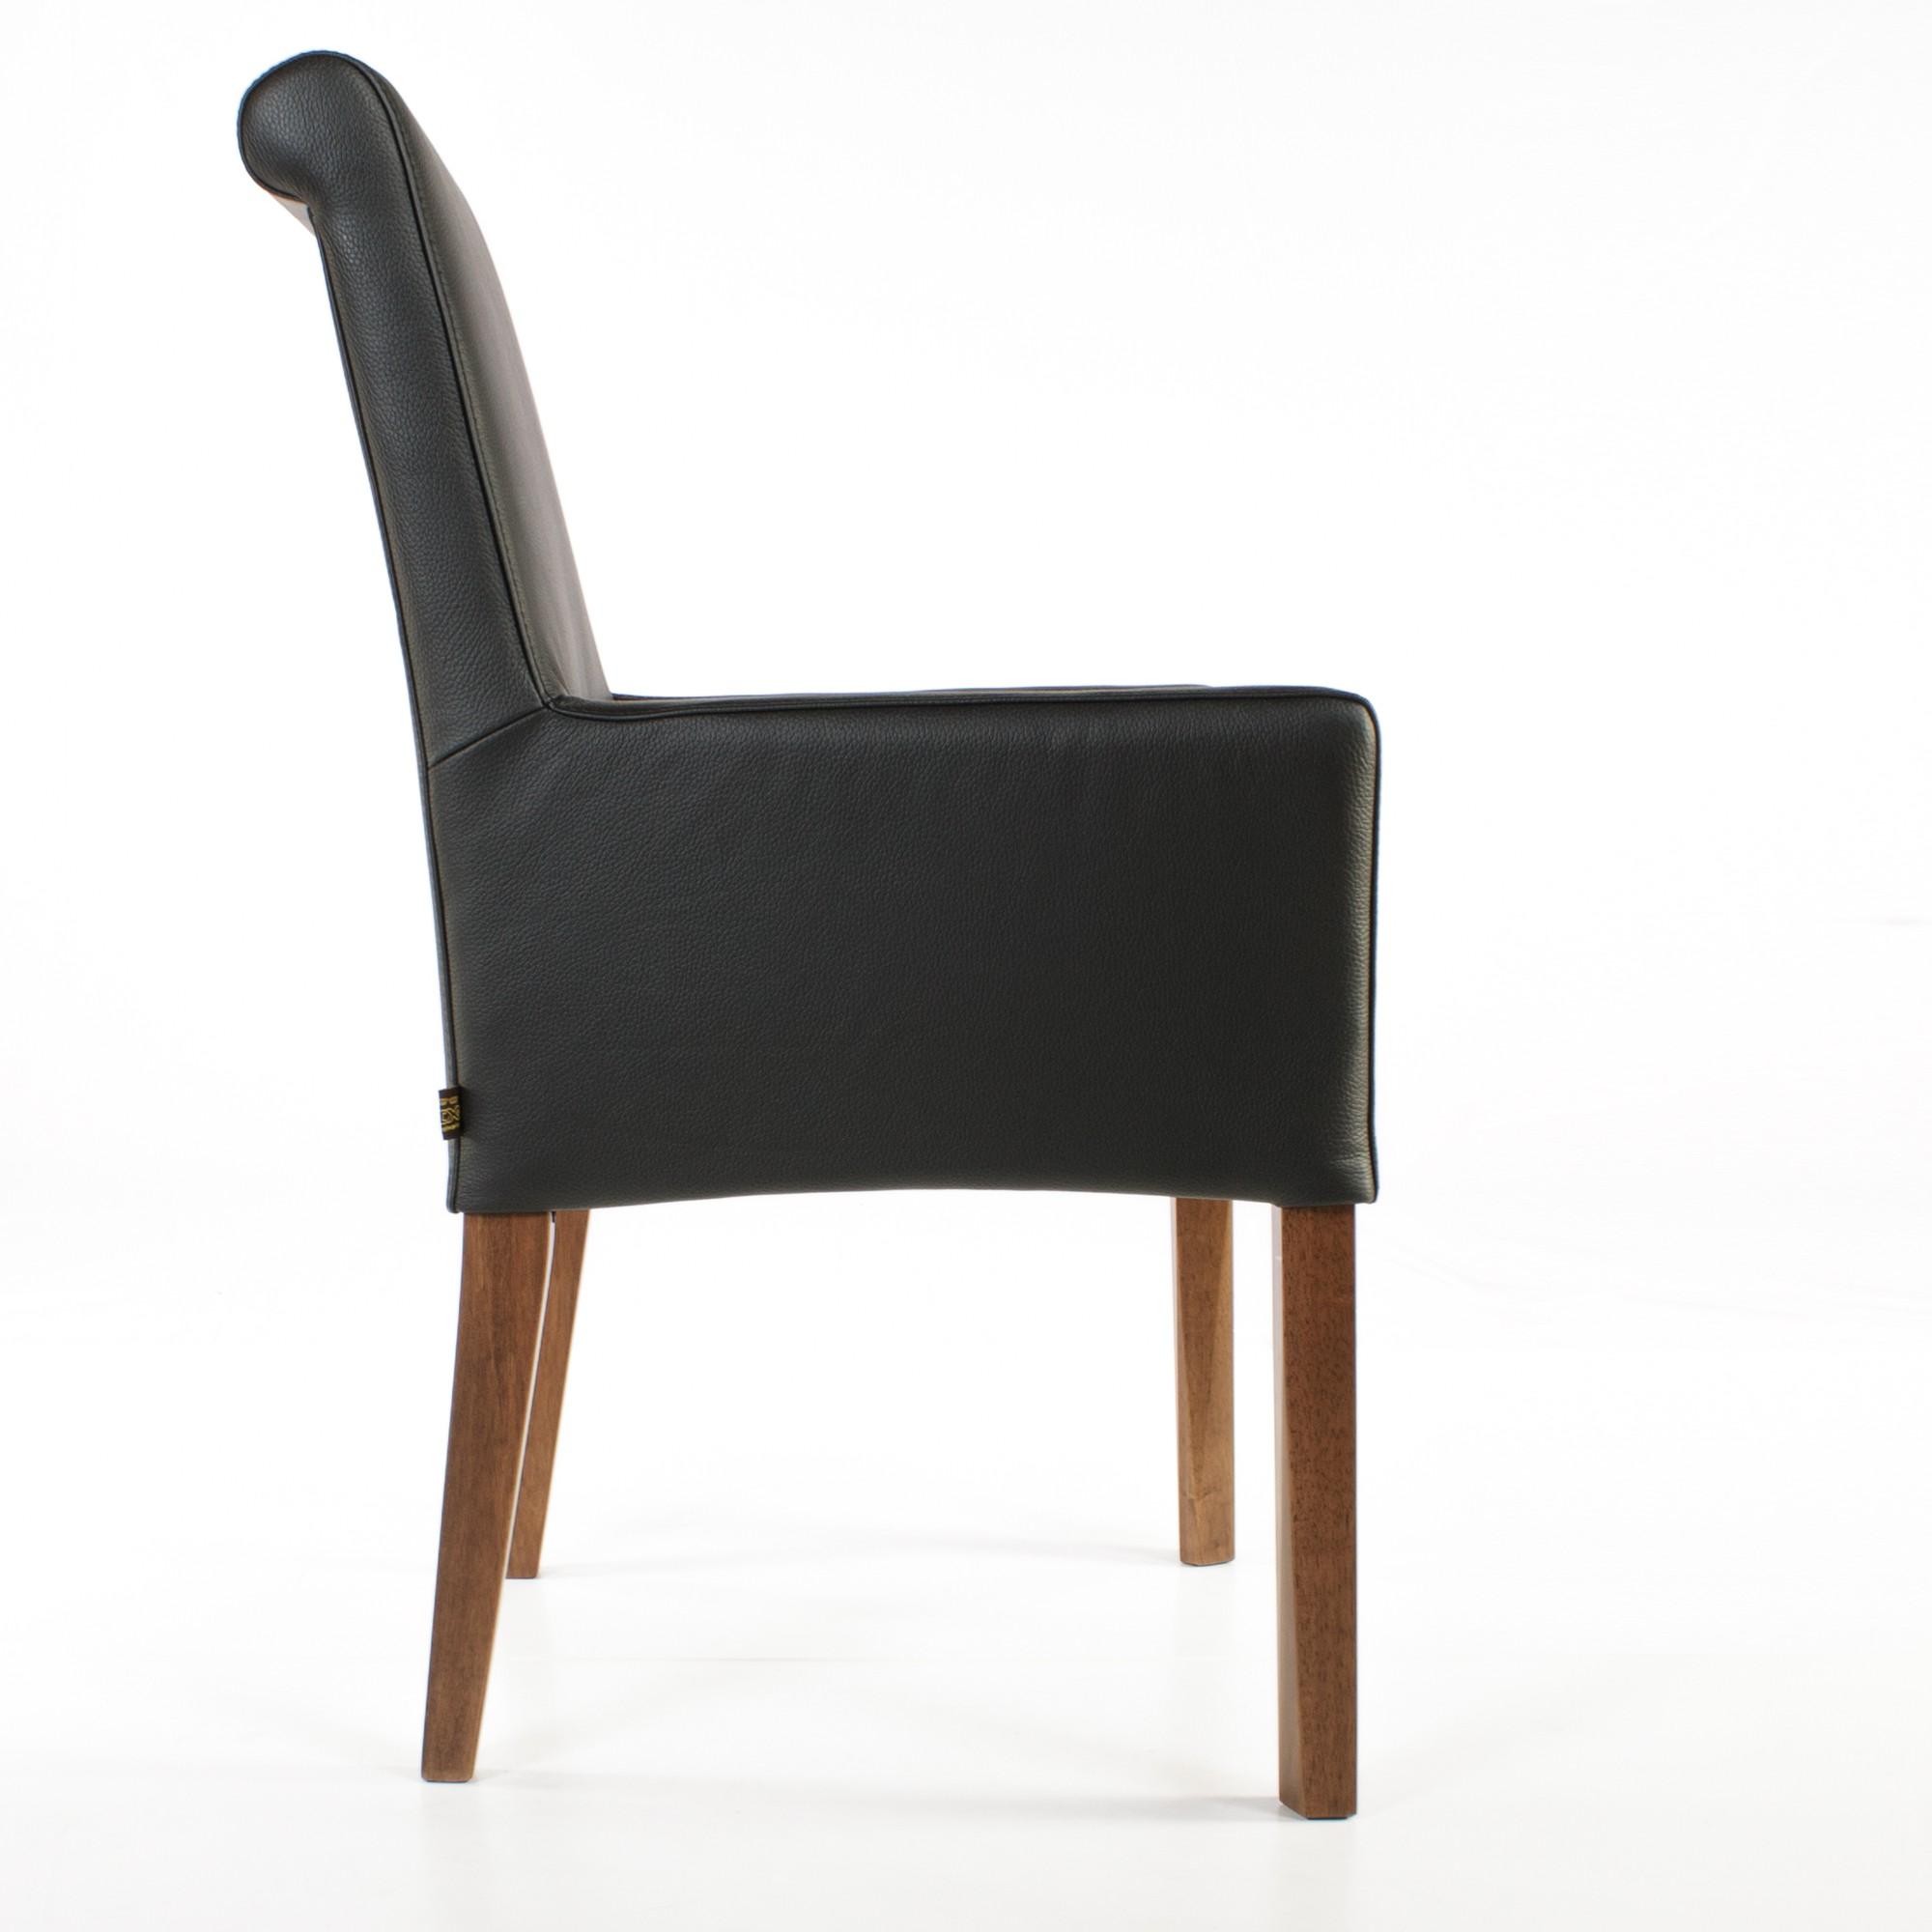 lederstuhl armlehnstuhl galdo schwarz nussbaum. Black Bedroom Furniture Sets. Home Design Ideas